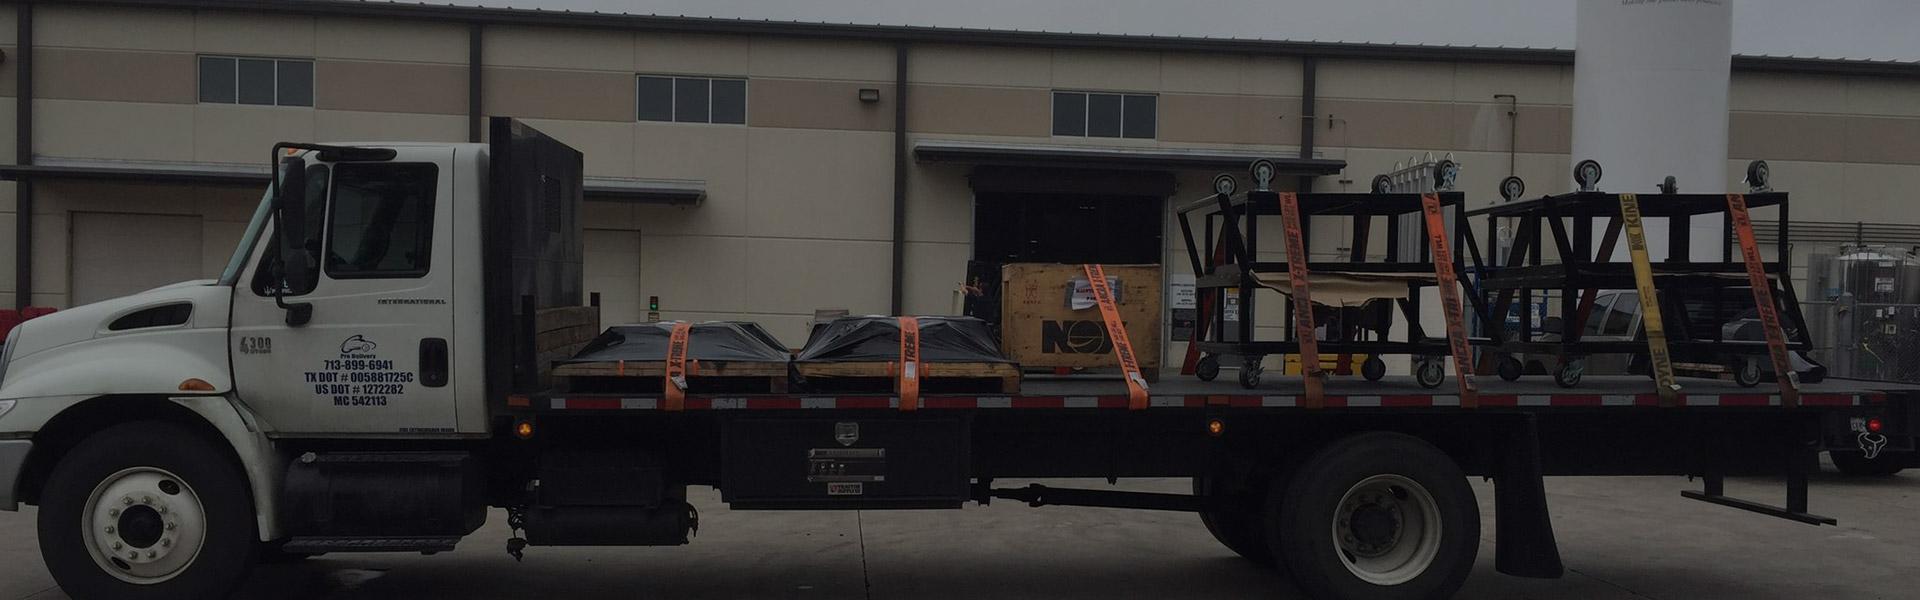 Trucking Company in Houston, TX | Hot Shot & Heavy Trucking